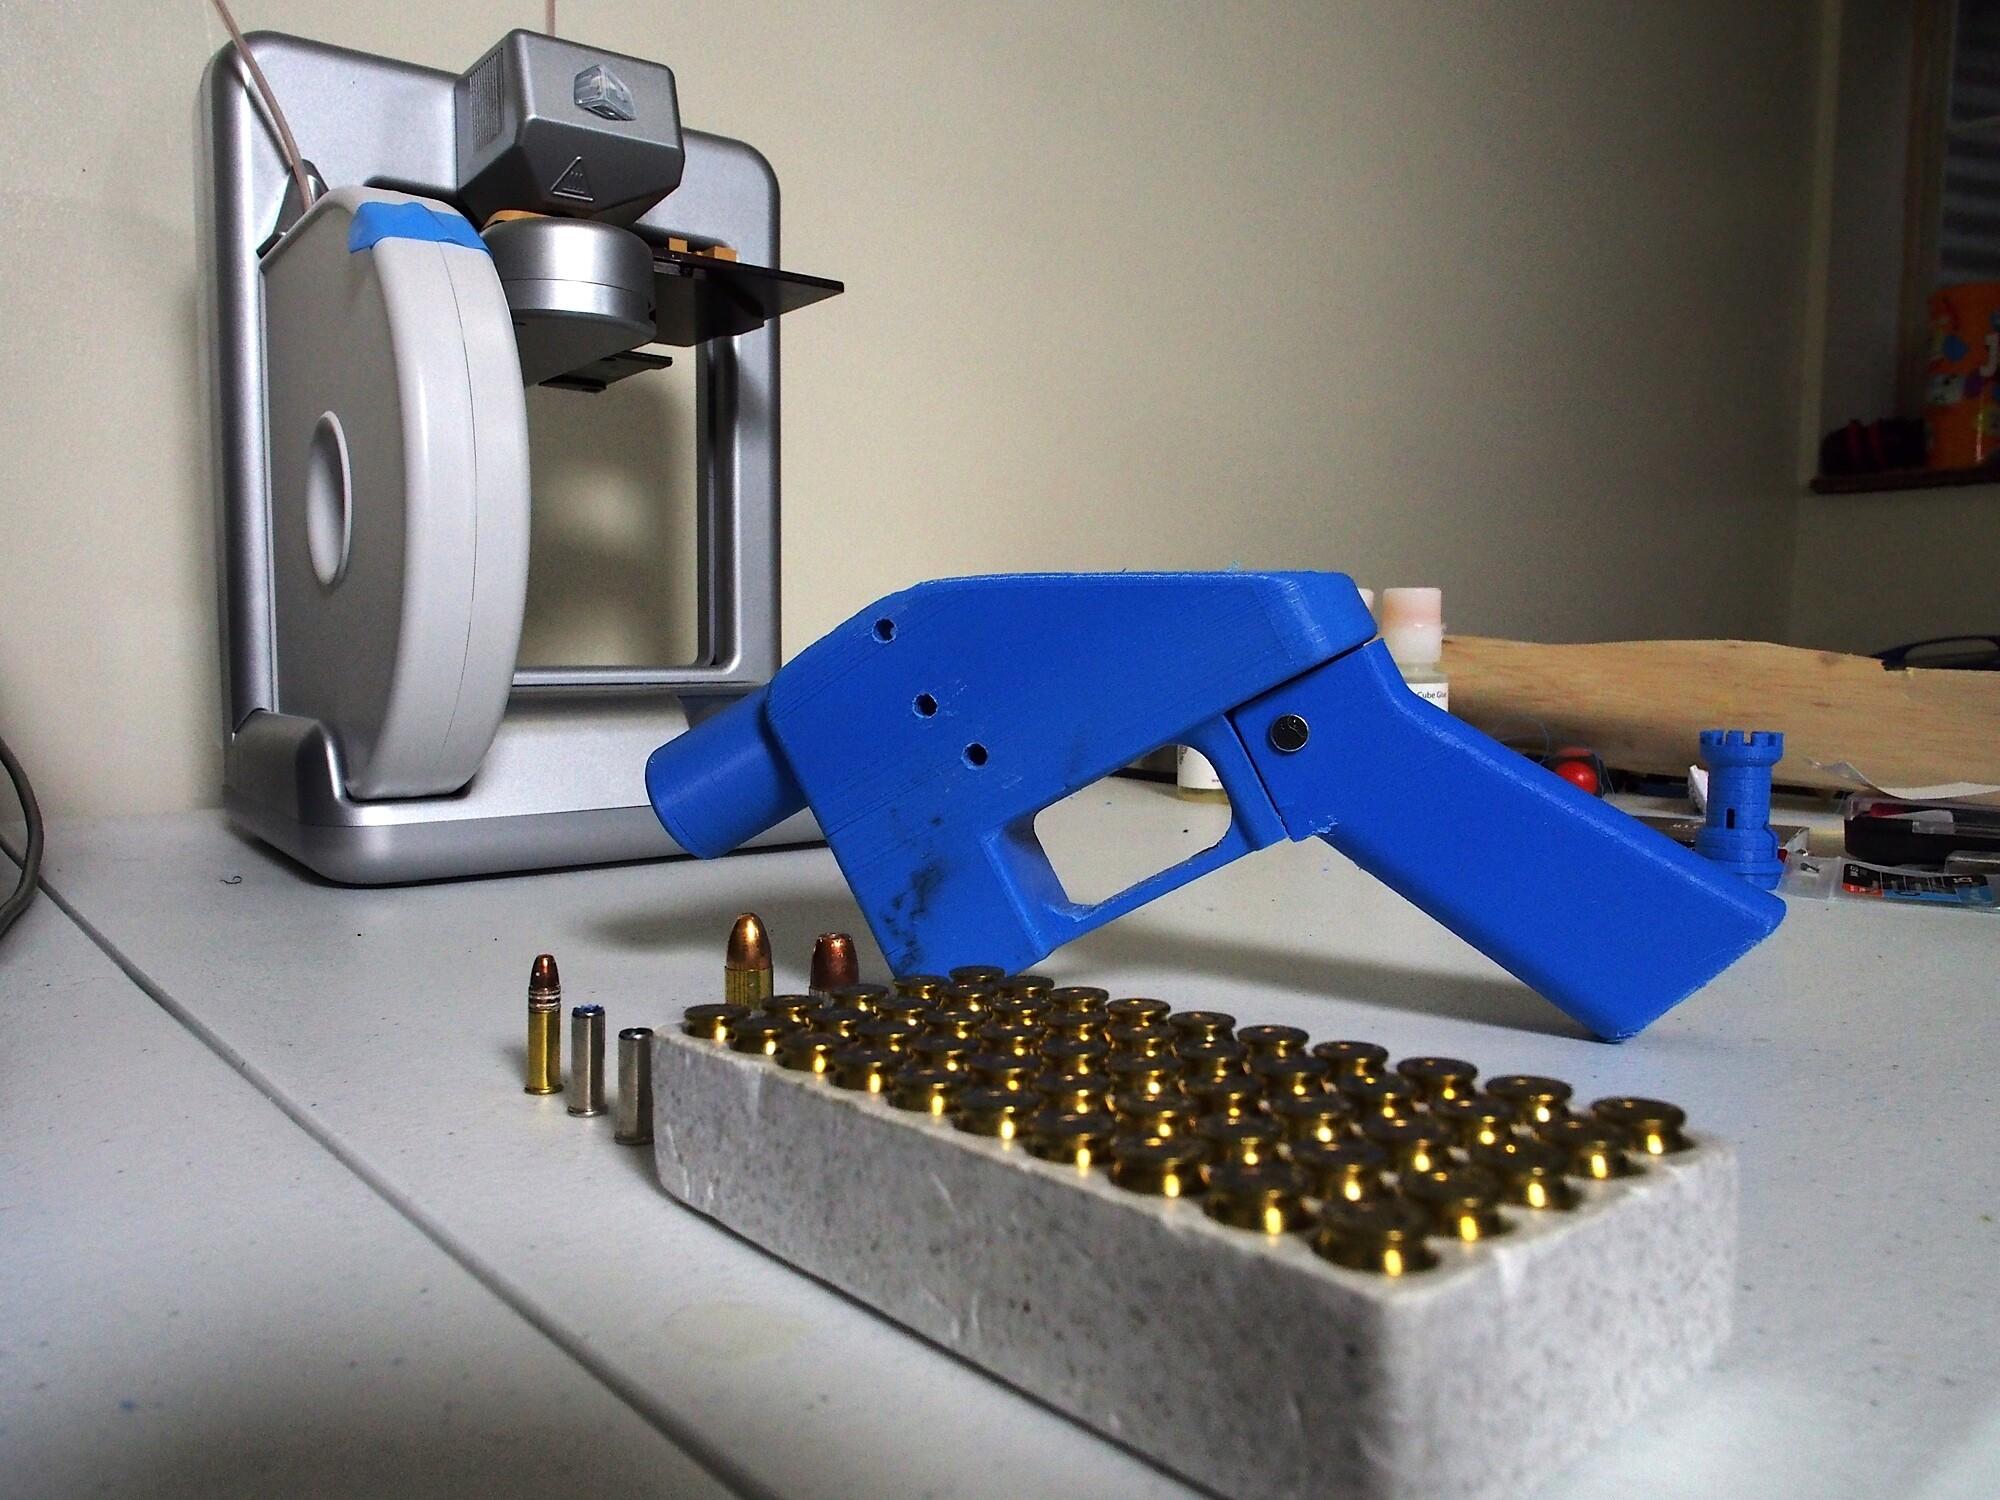 Fact Check: Can You Make an AR-15 With a 3D Printer?